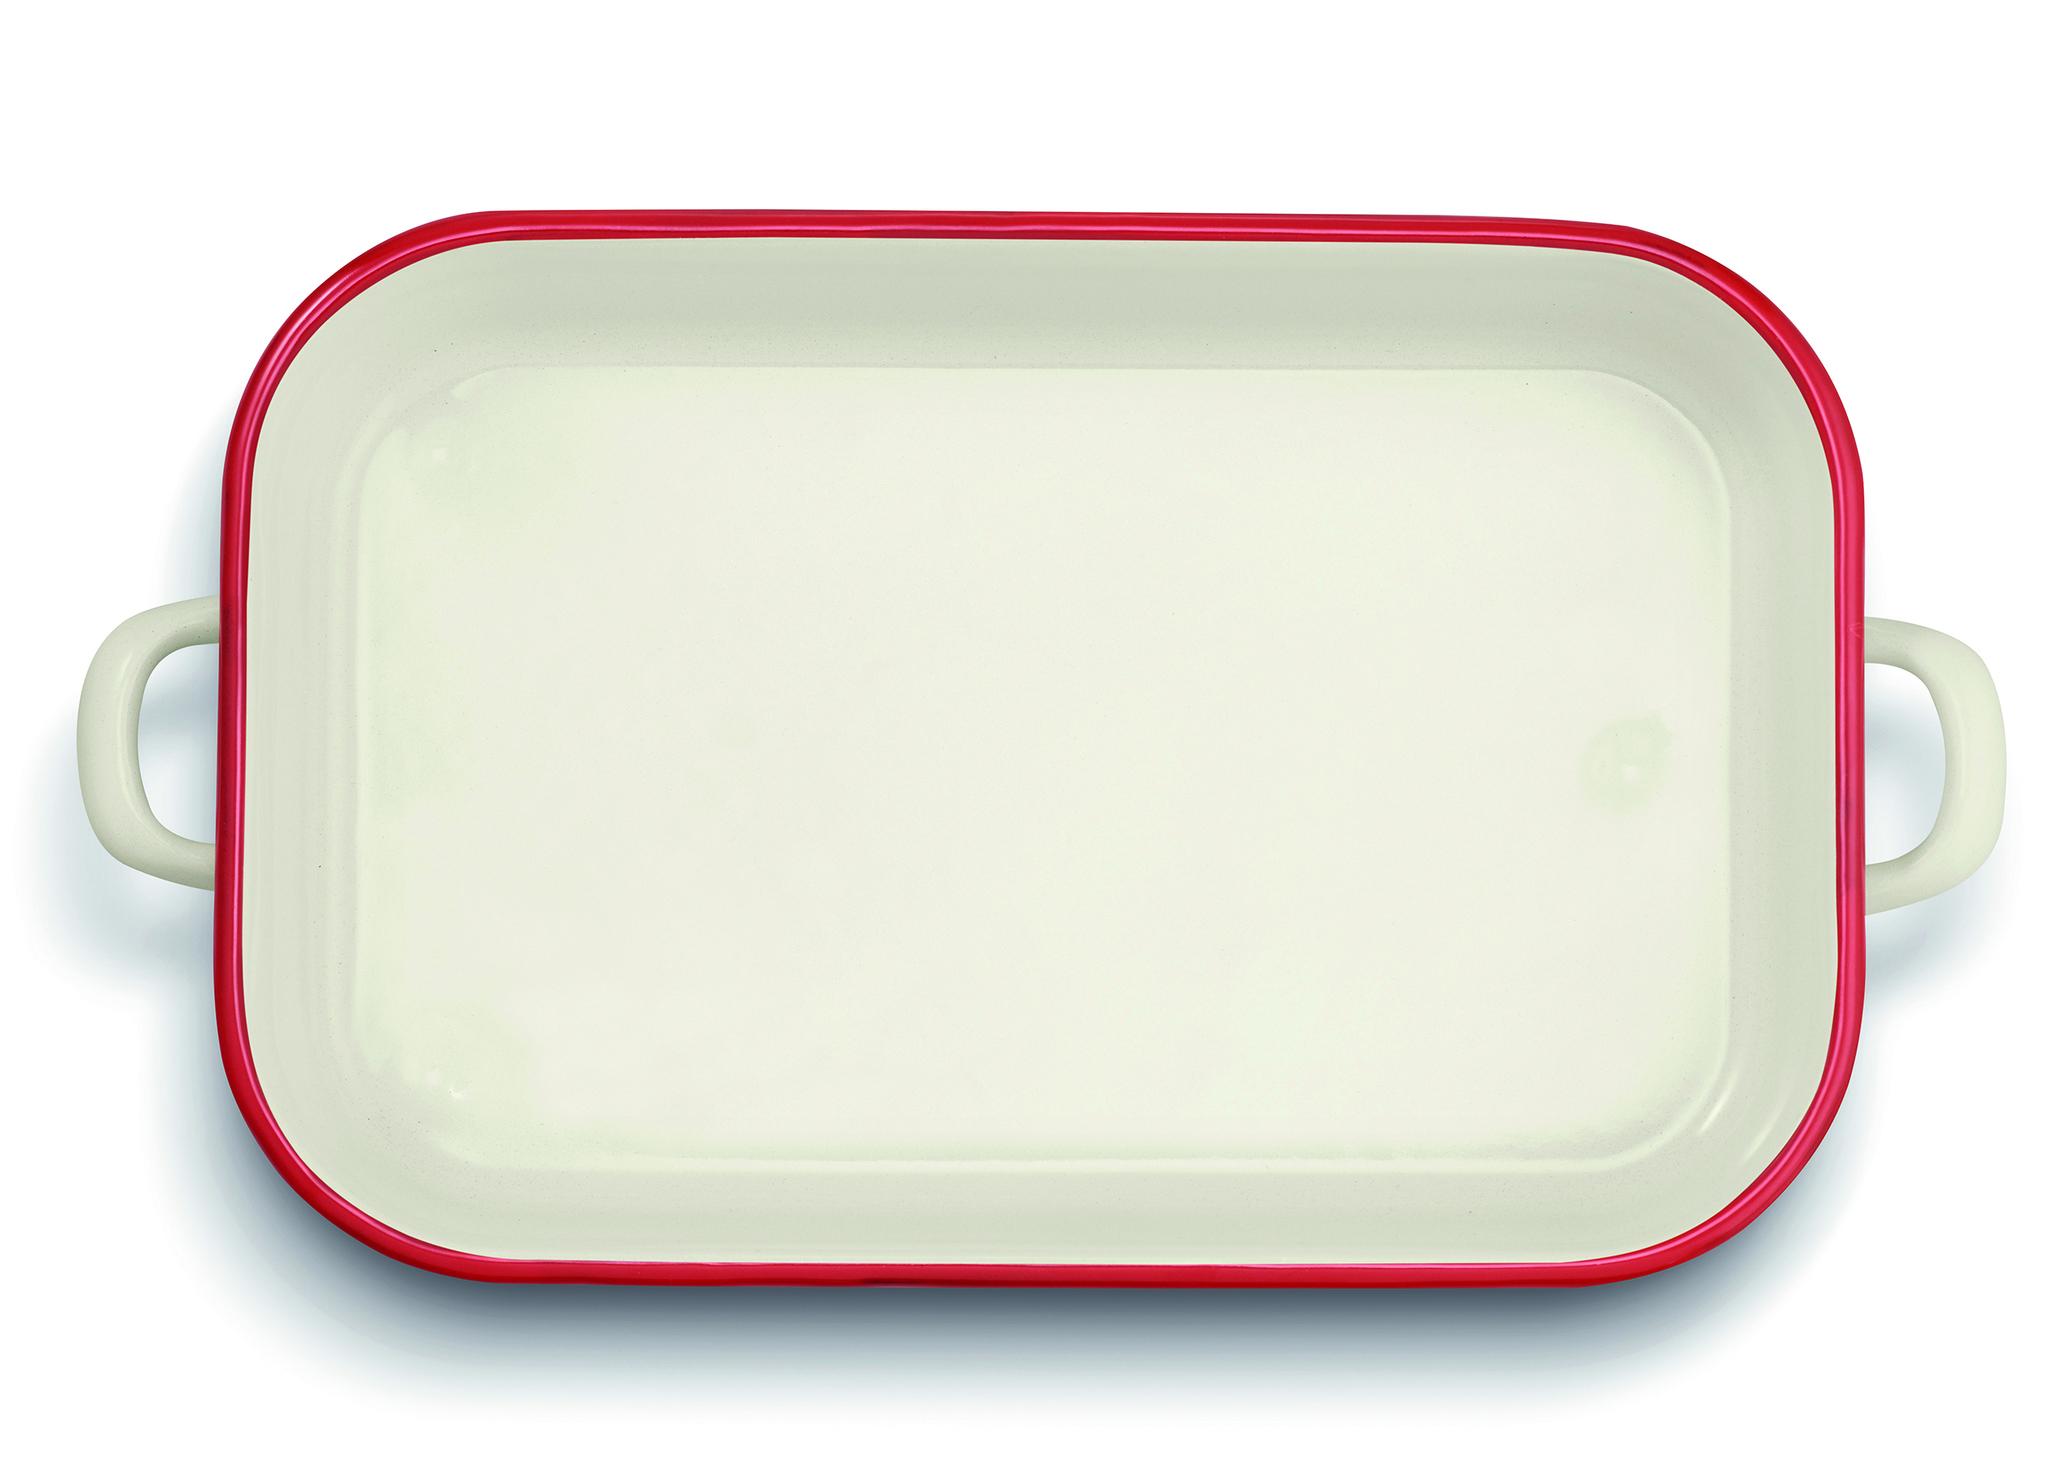 Форма для запекания BEKA BOHEME RED (32 см)